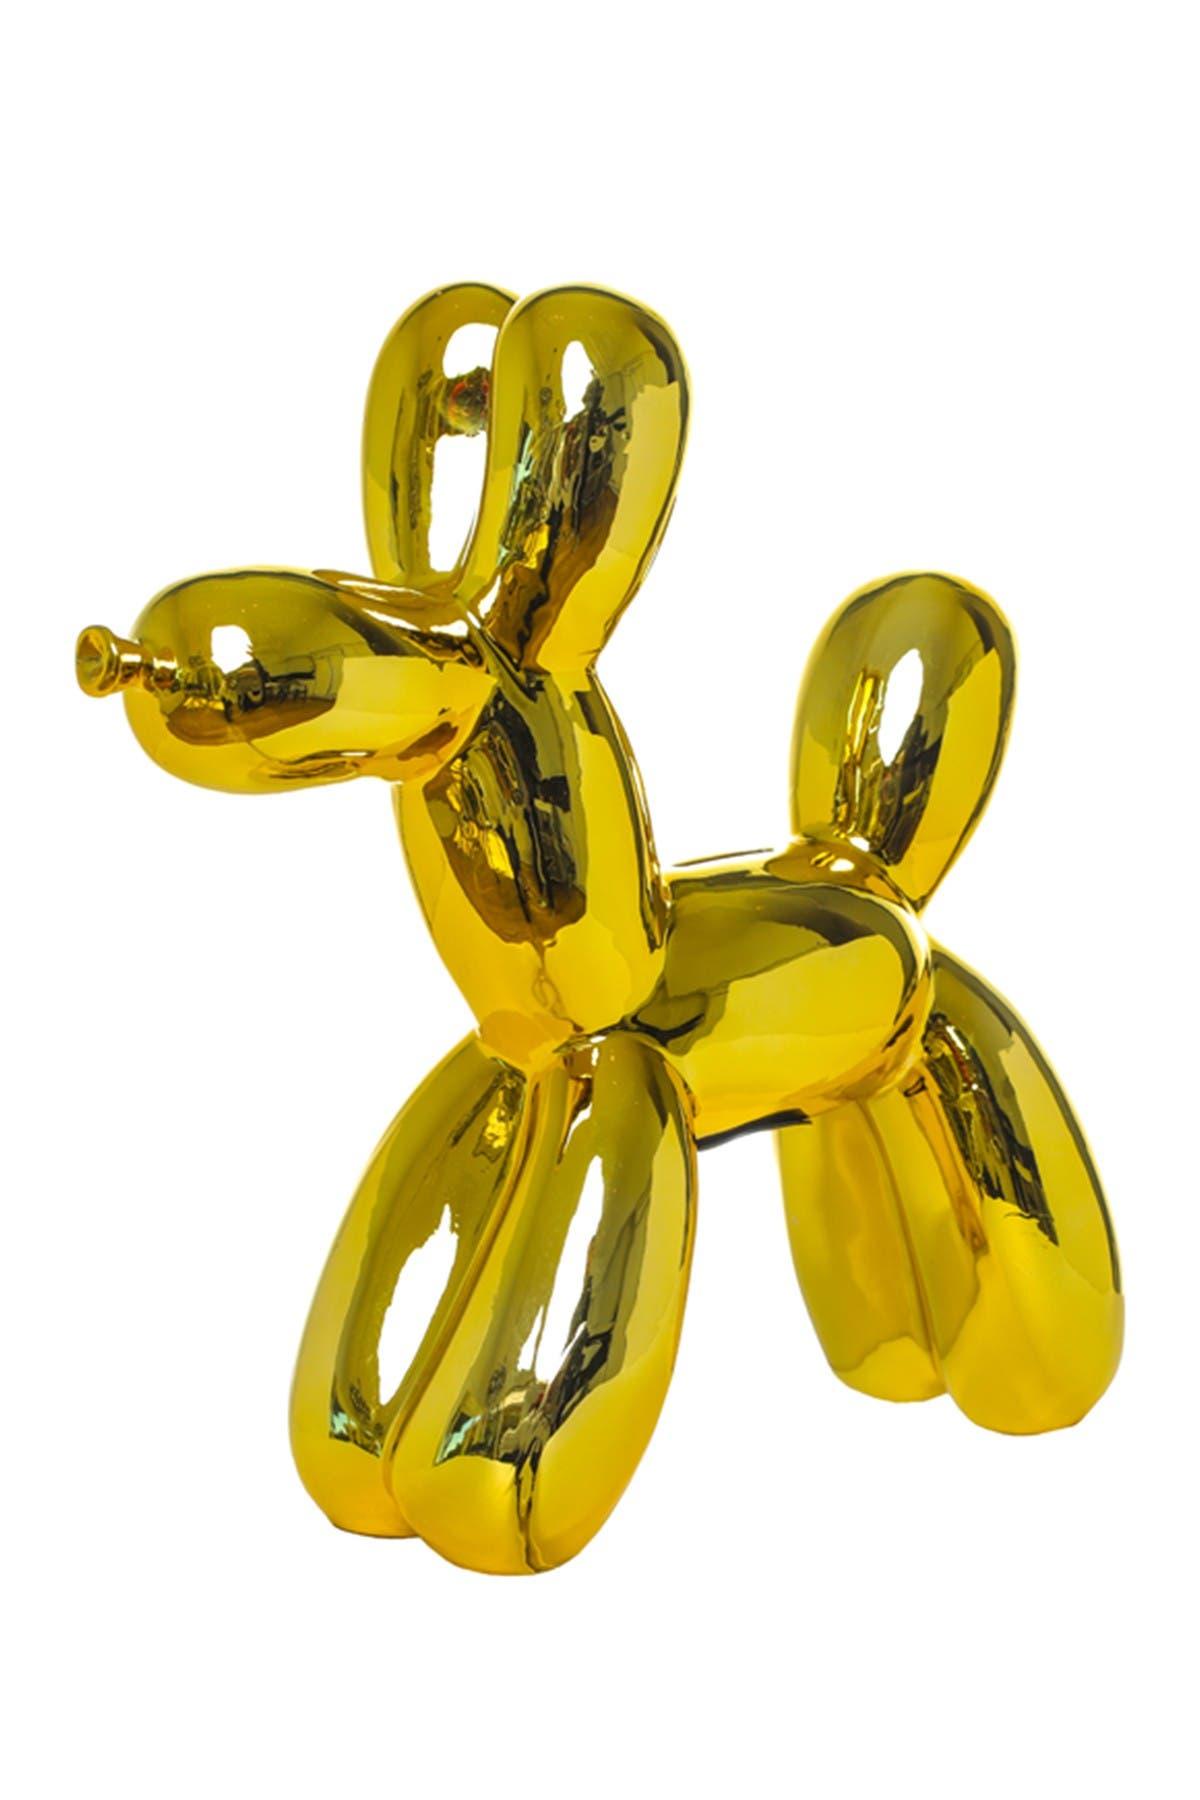 Image of Interior Illusions Plus Yellow Mini Balloon Dog Bank